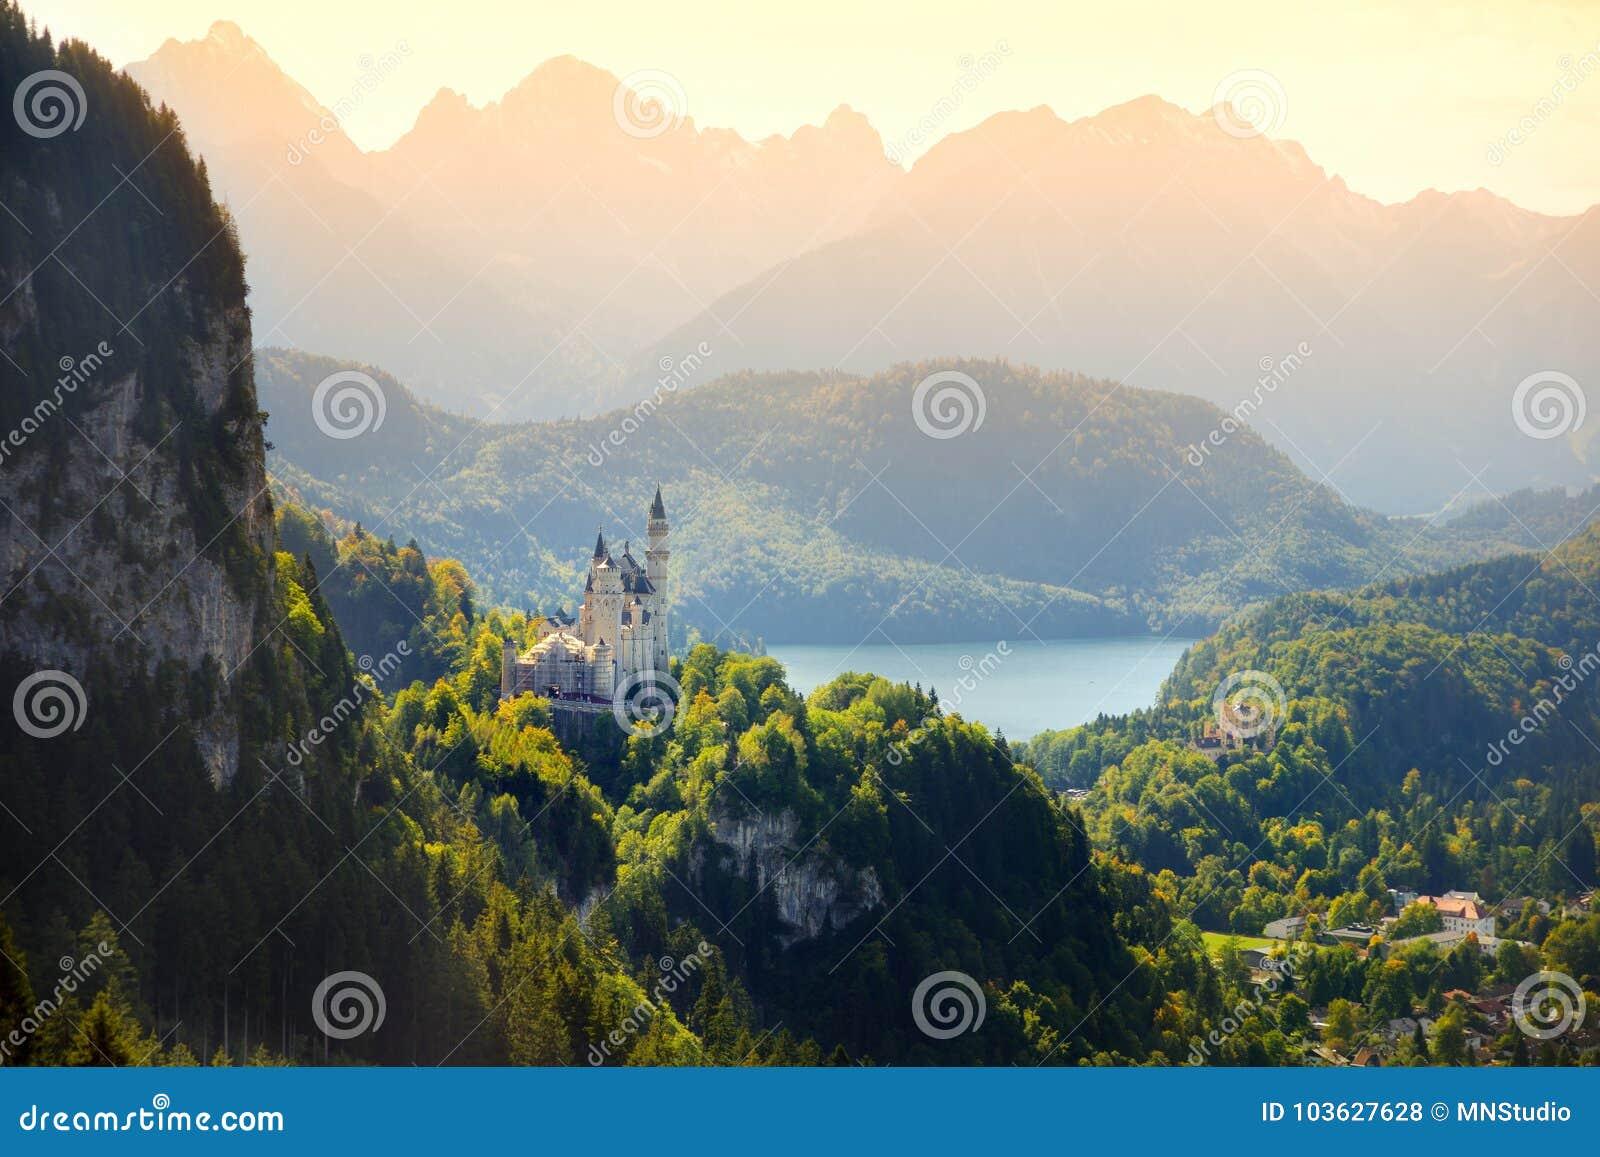 Famous Neuschwanstein Castle, fairy-tale palace on a rugged hill above the village of Hohenschwangau near Fussen